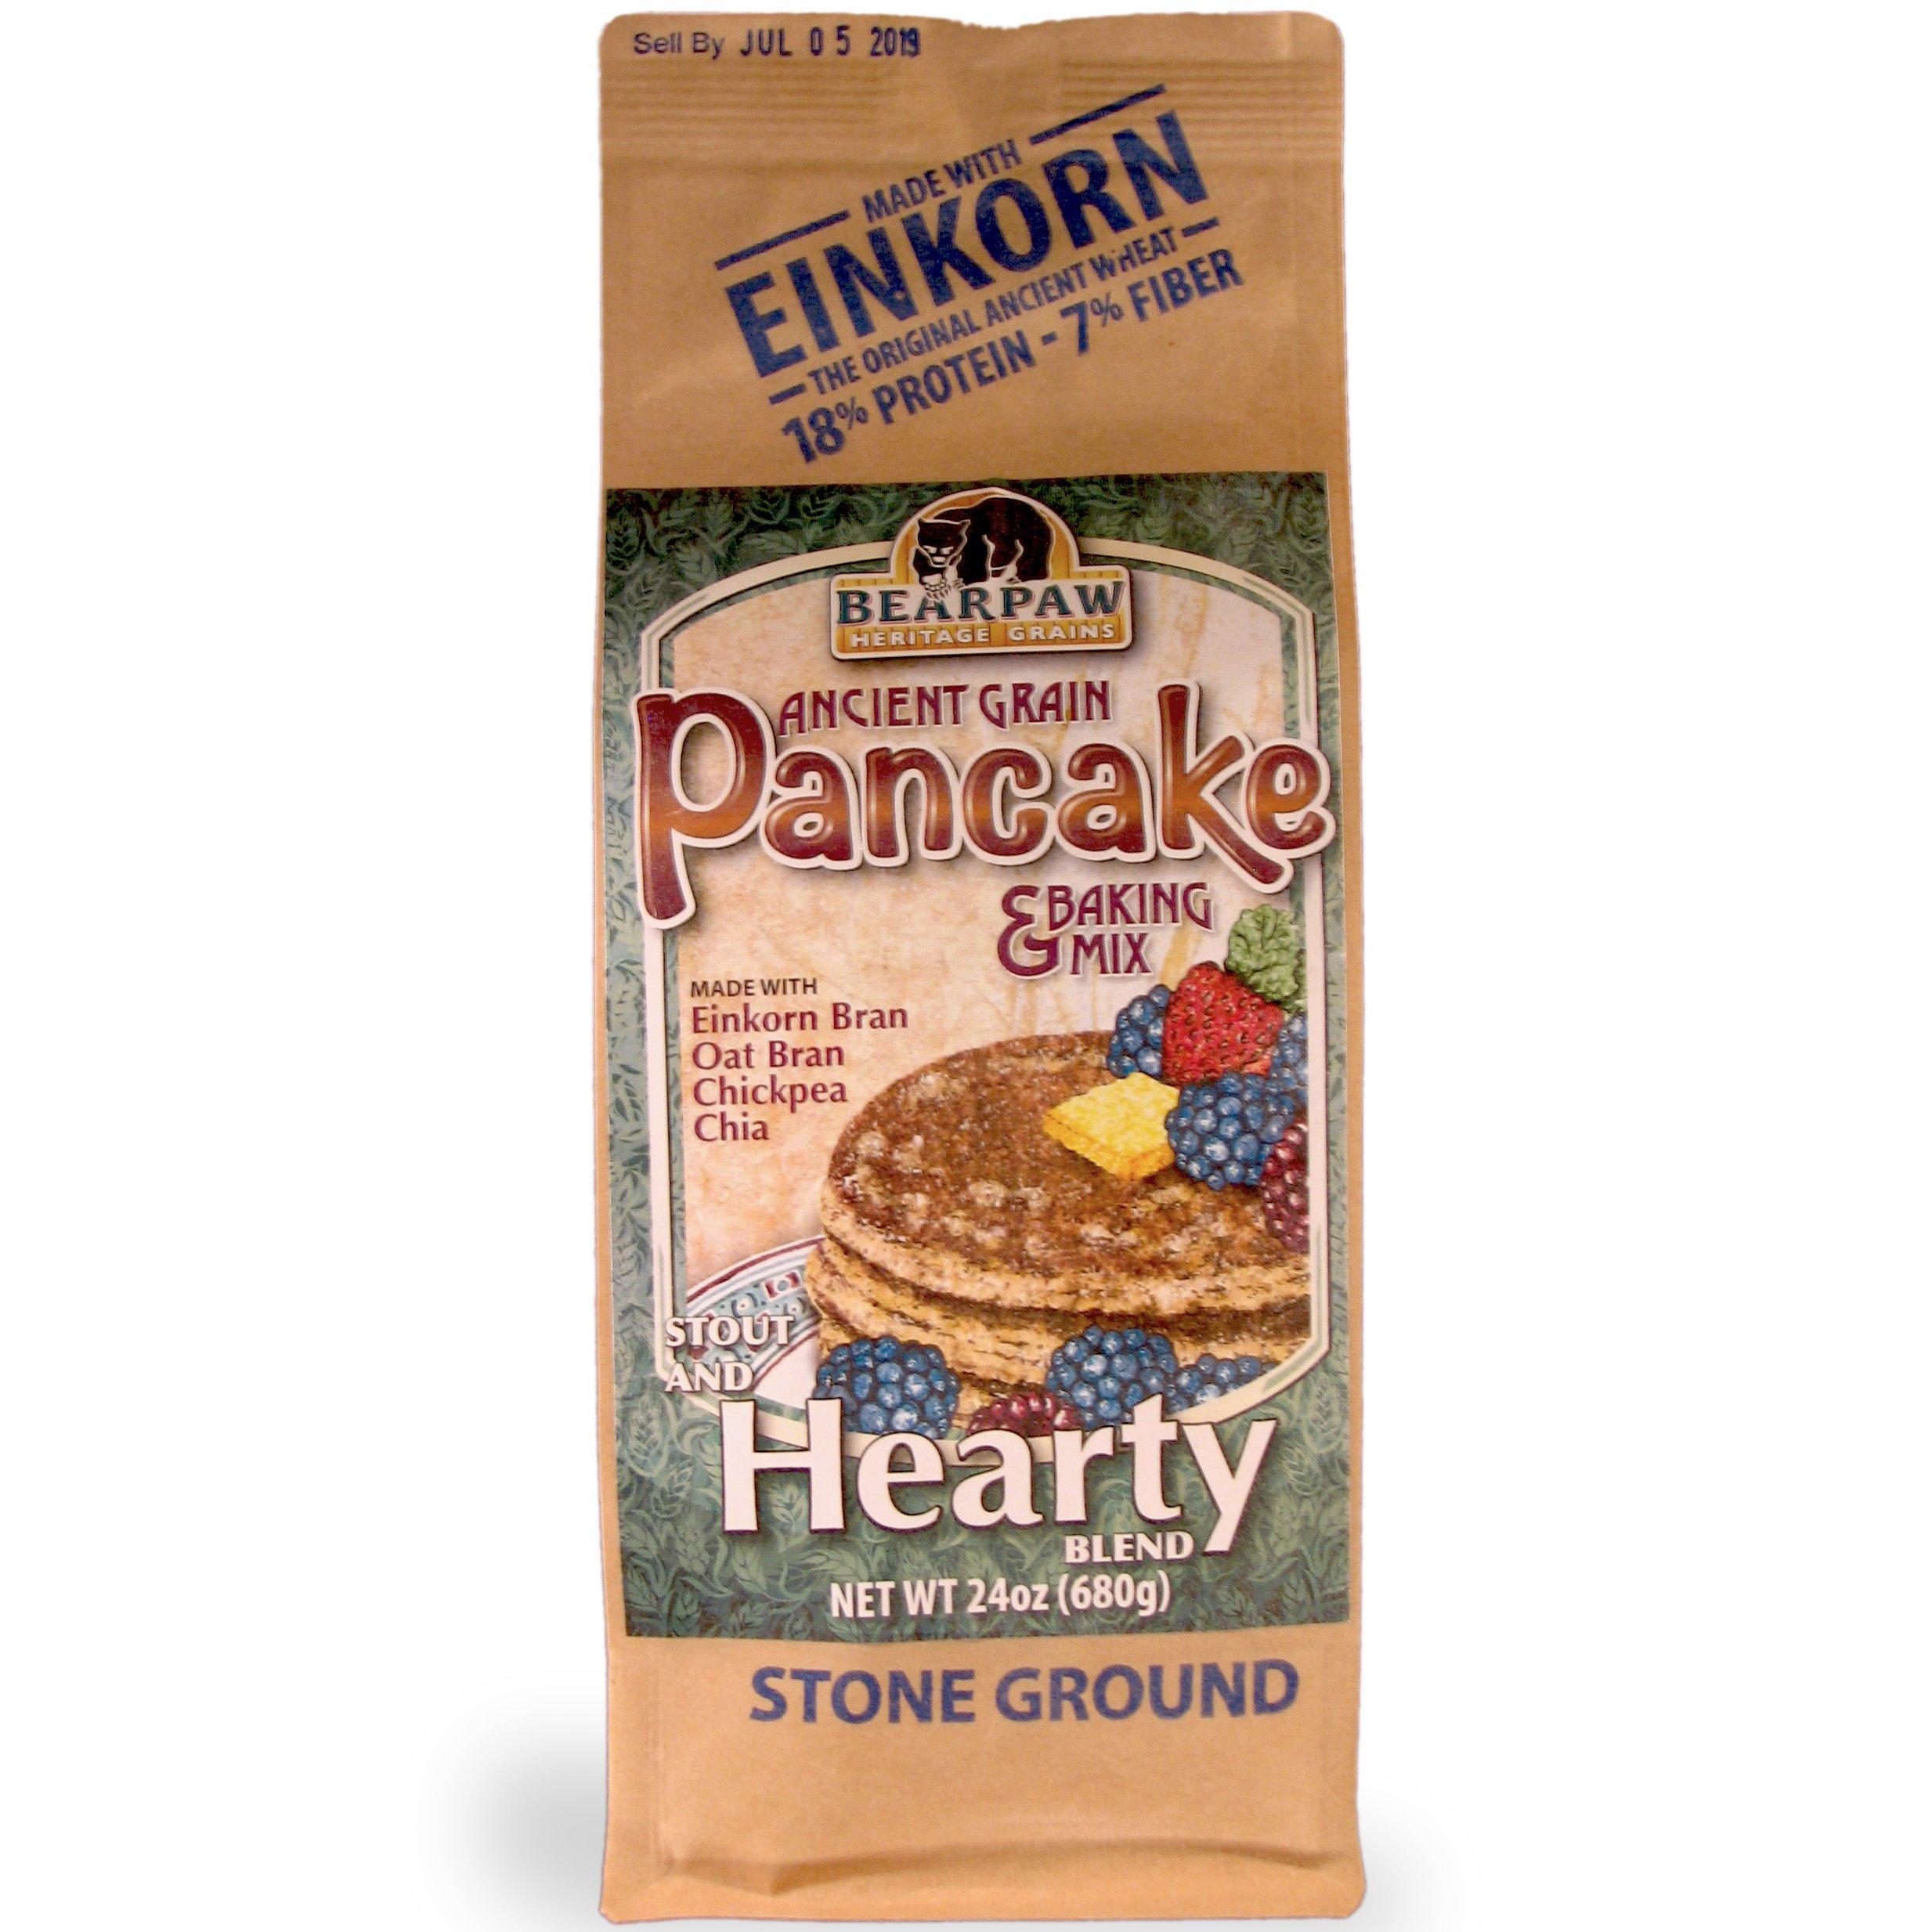 Bearpaw Ancient Grain Pancake Mix, Hearty Blend (24 oz), High Fiber Einkorn Bran, Oat Bran, BearpawGrains 861262000388